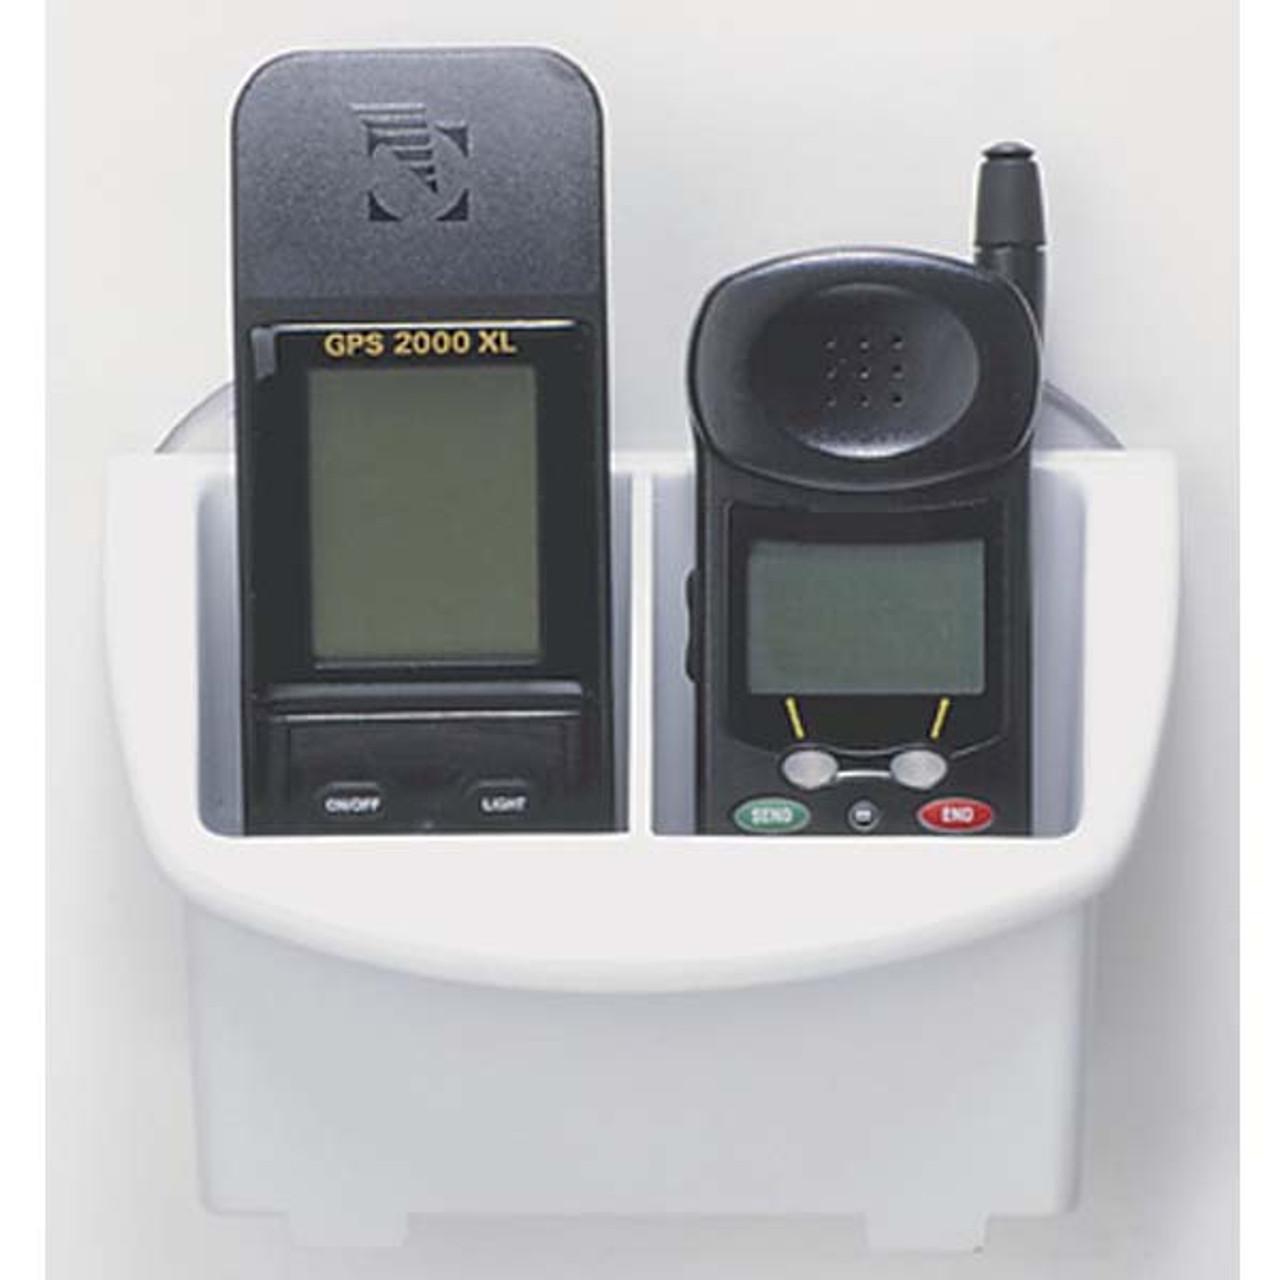 Boat Marine RV STORAGE CADDY Organizer Electronics Phone Holder w// Suction Cups